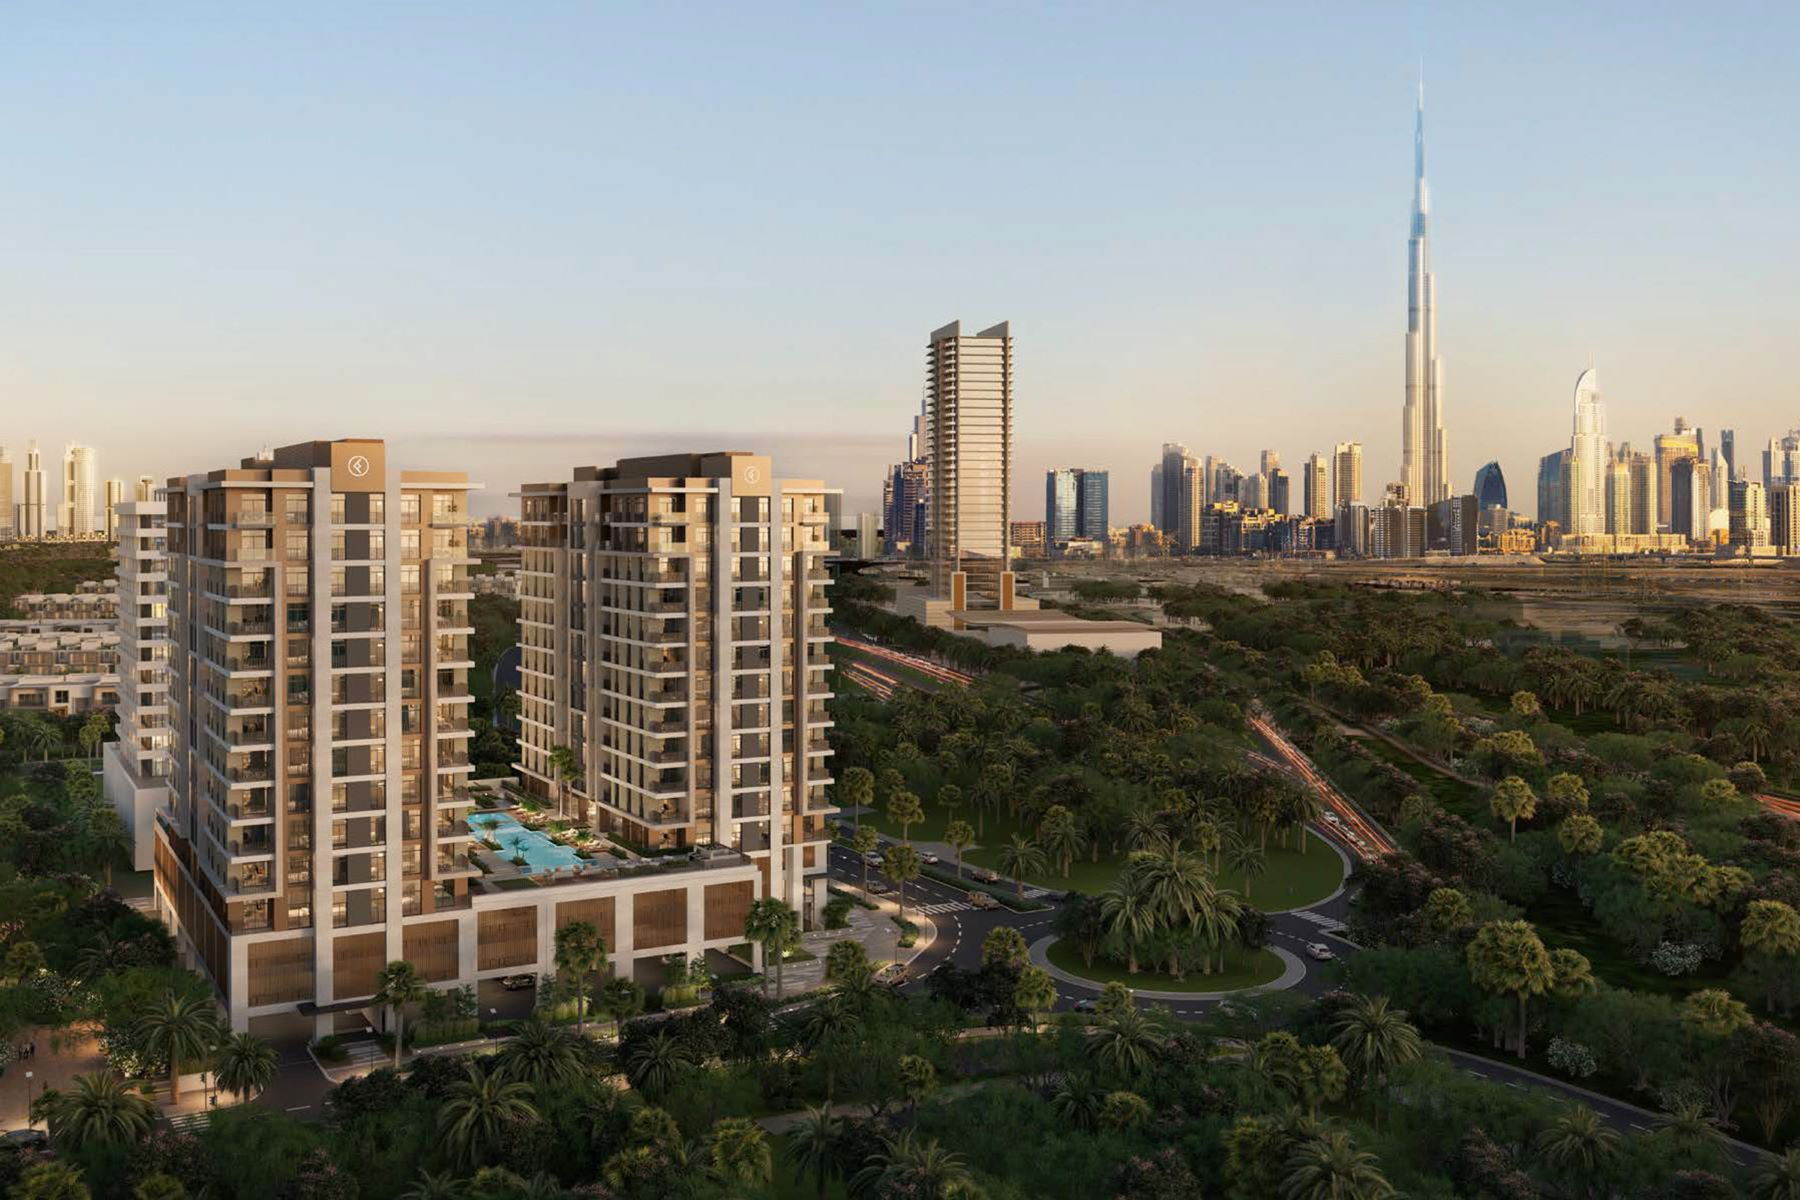 apartments for Sale at Modern Architecture Wilton Terraces 1 Mohammad Bin Rashid City Wilton Terraces 1 Dubai, Dubai 00000 United Arab Emirates